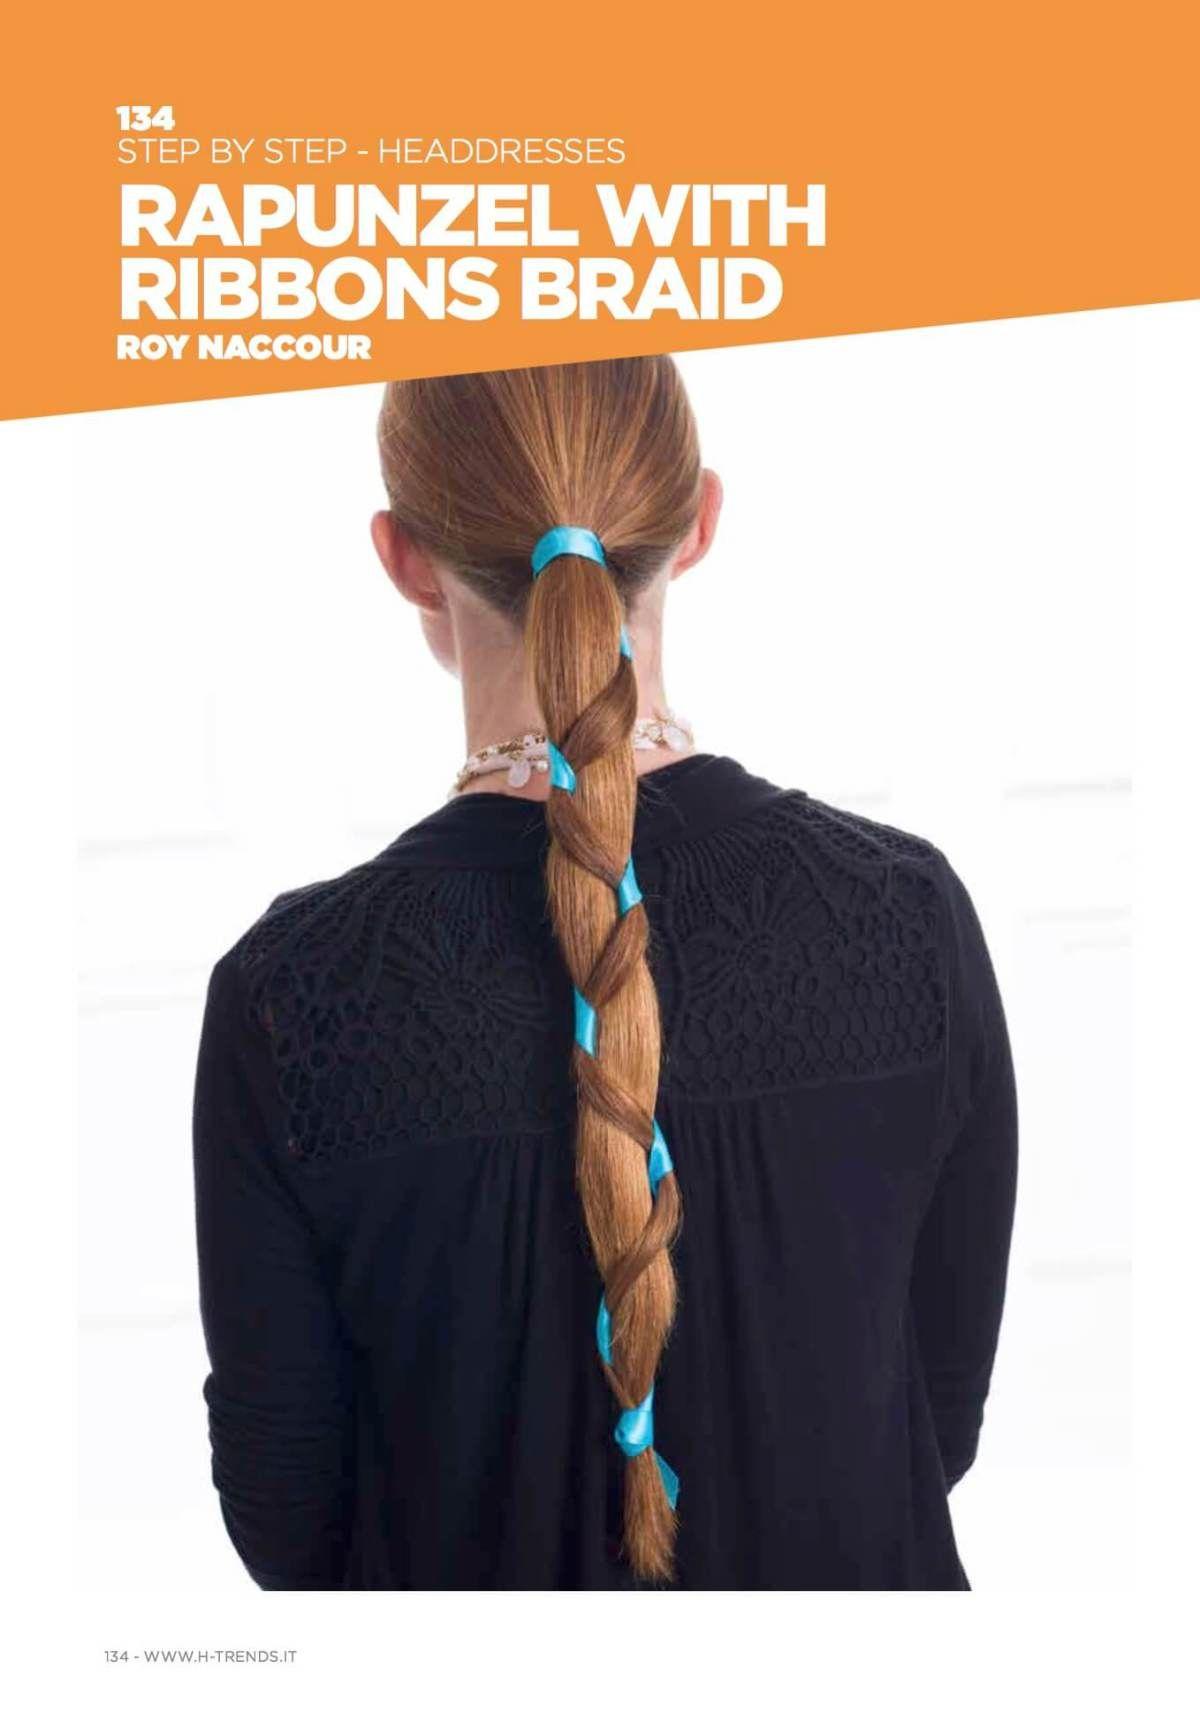 H Trends Italian Magazine J Joseph Salon Hair Magazine Ribbon Braids Trending